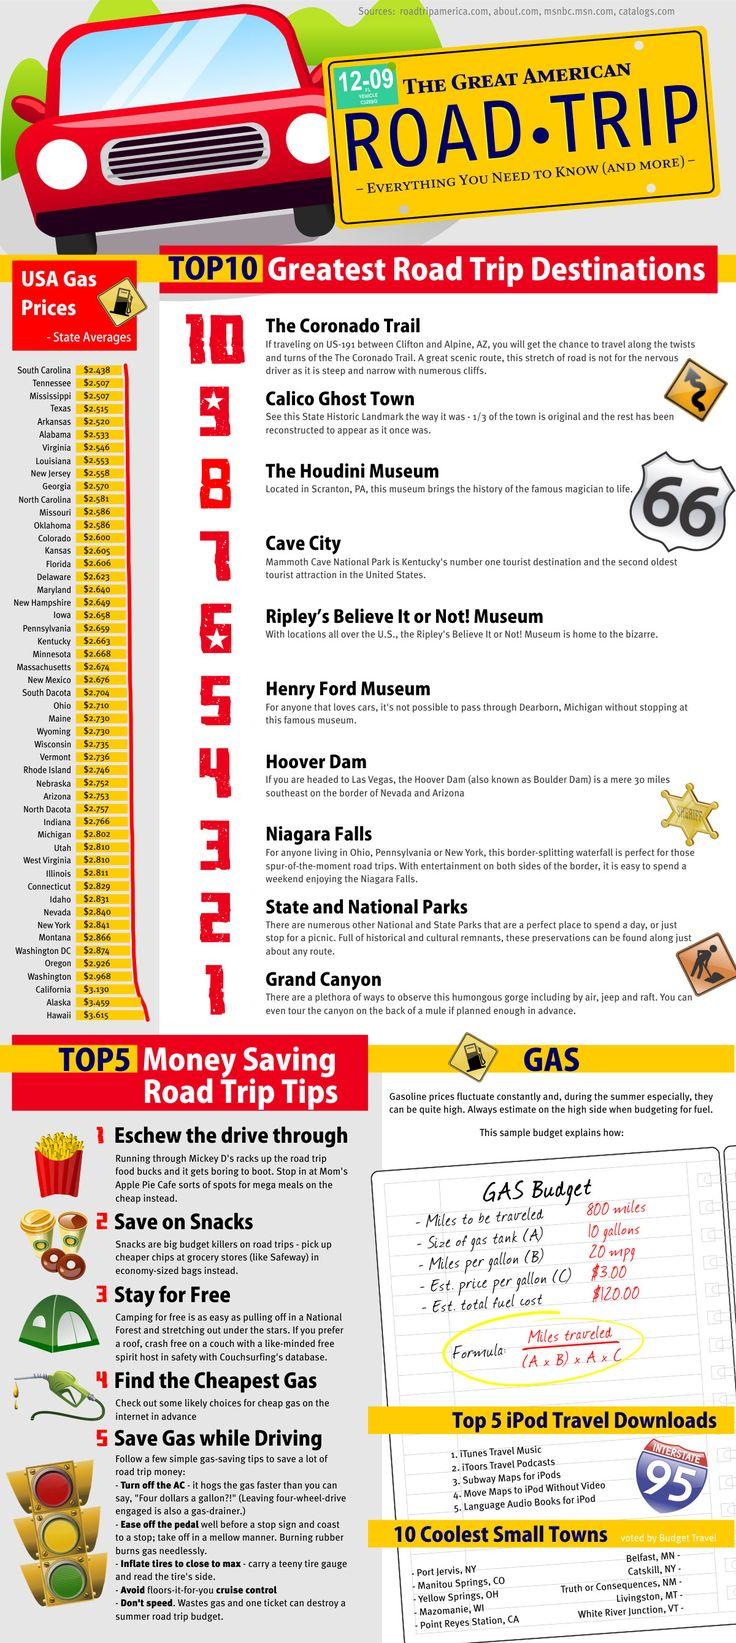 roadtrip gas cost calculator apps 148apps